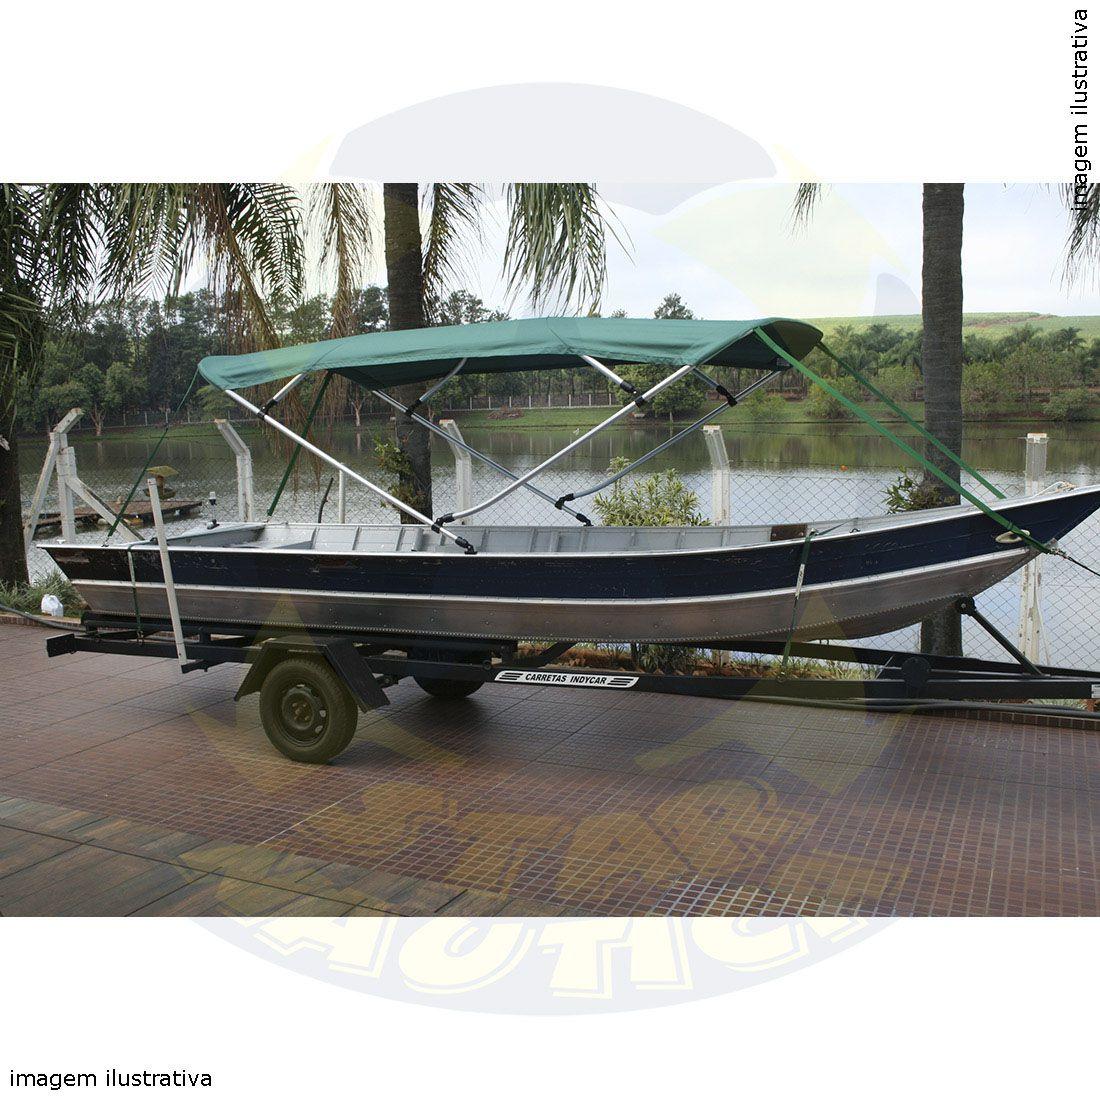 Capota Toldo Barco Marujo 500 Vinílica 4 Arcos Tubo 7/8